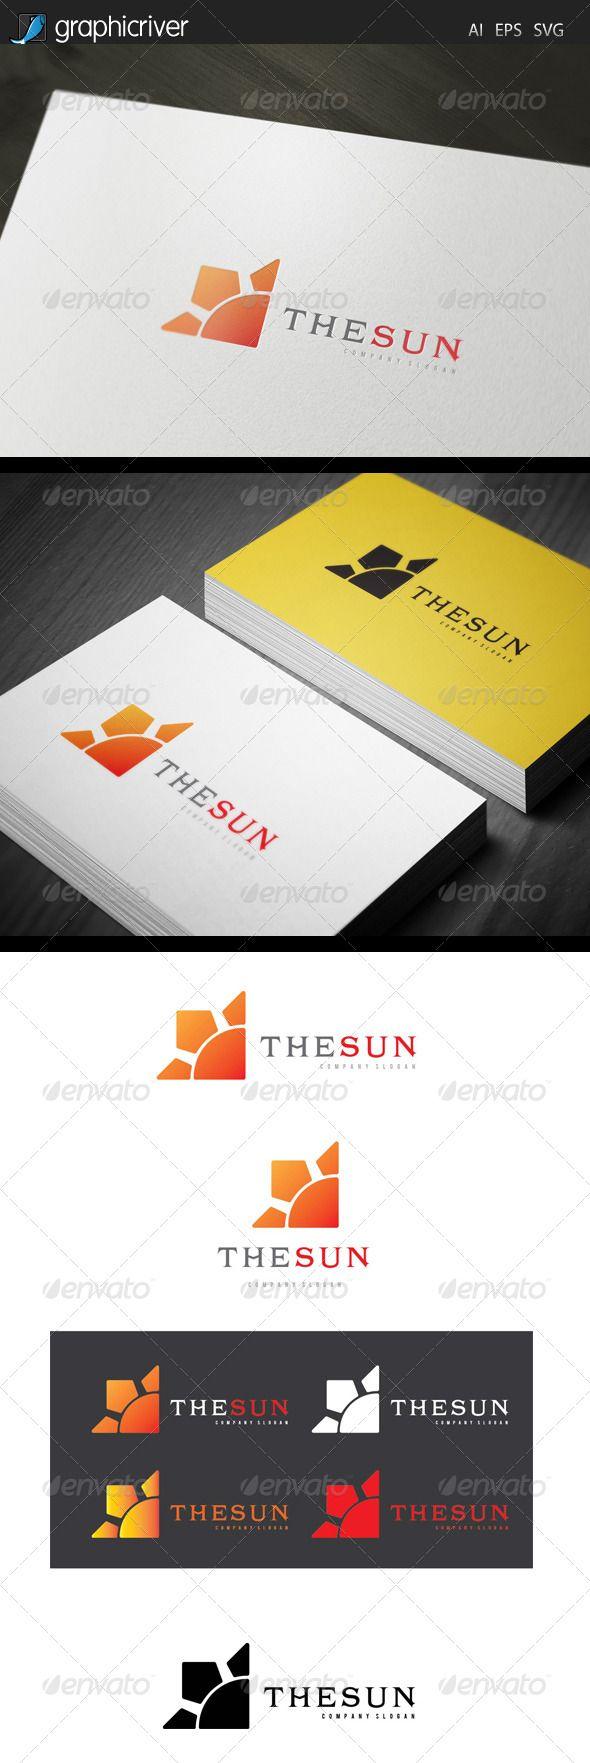 59 best logo design images on pinterest fox logo logo ideas and the sun logo design template vector logotype download it here http baanklon Gallery